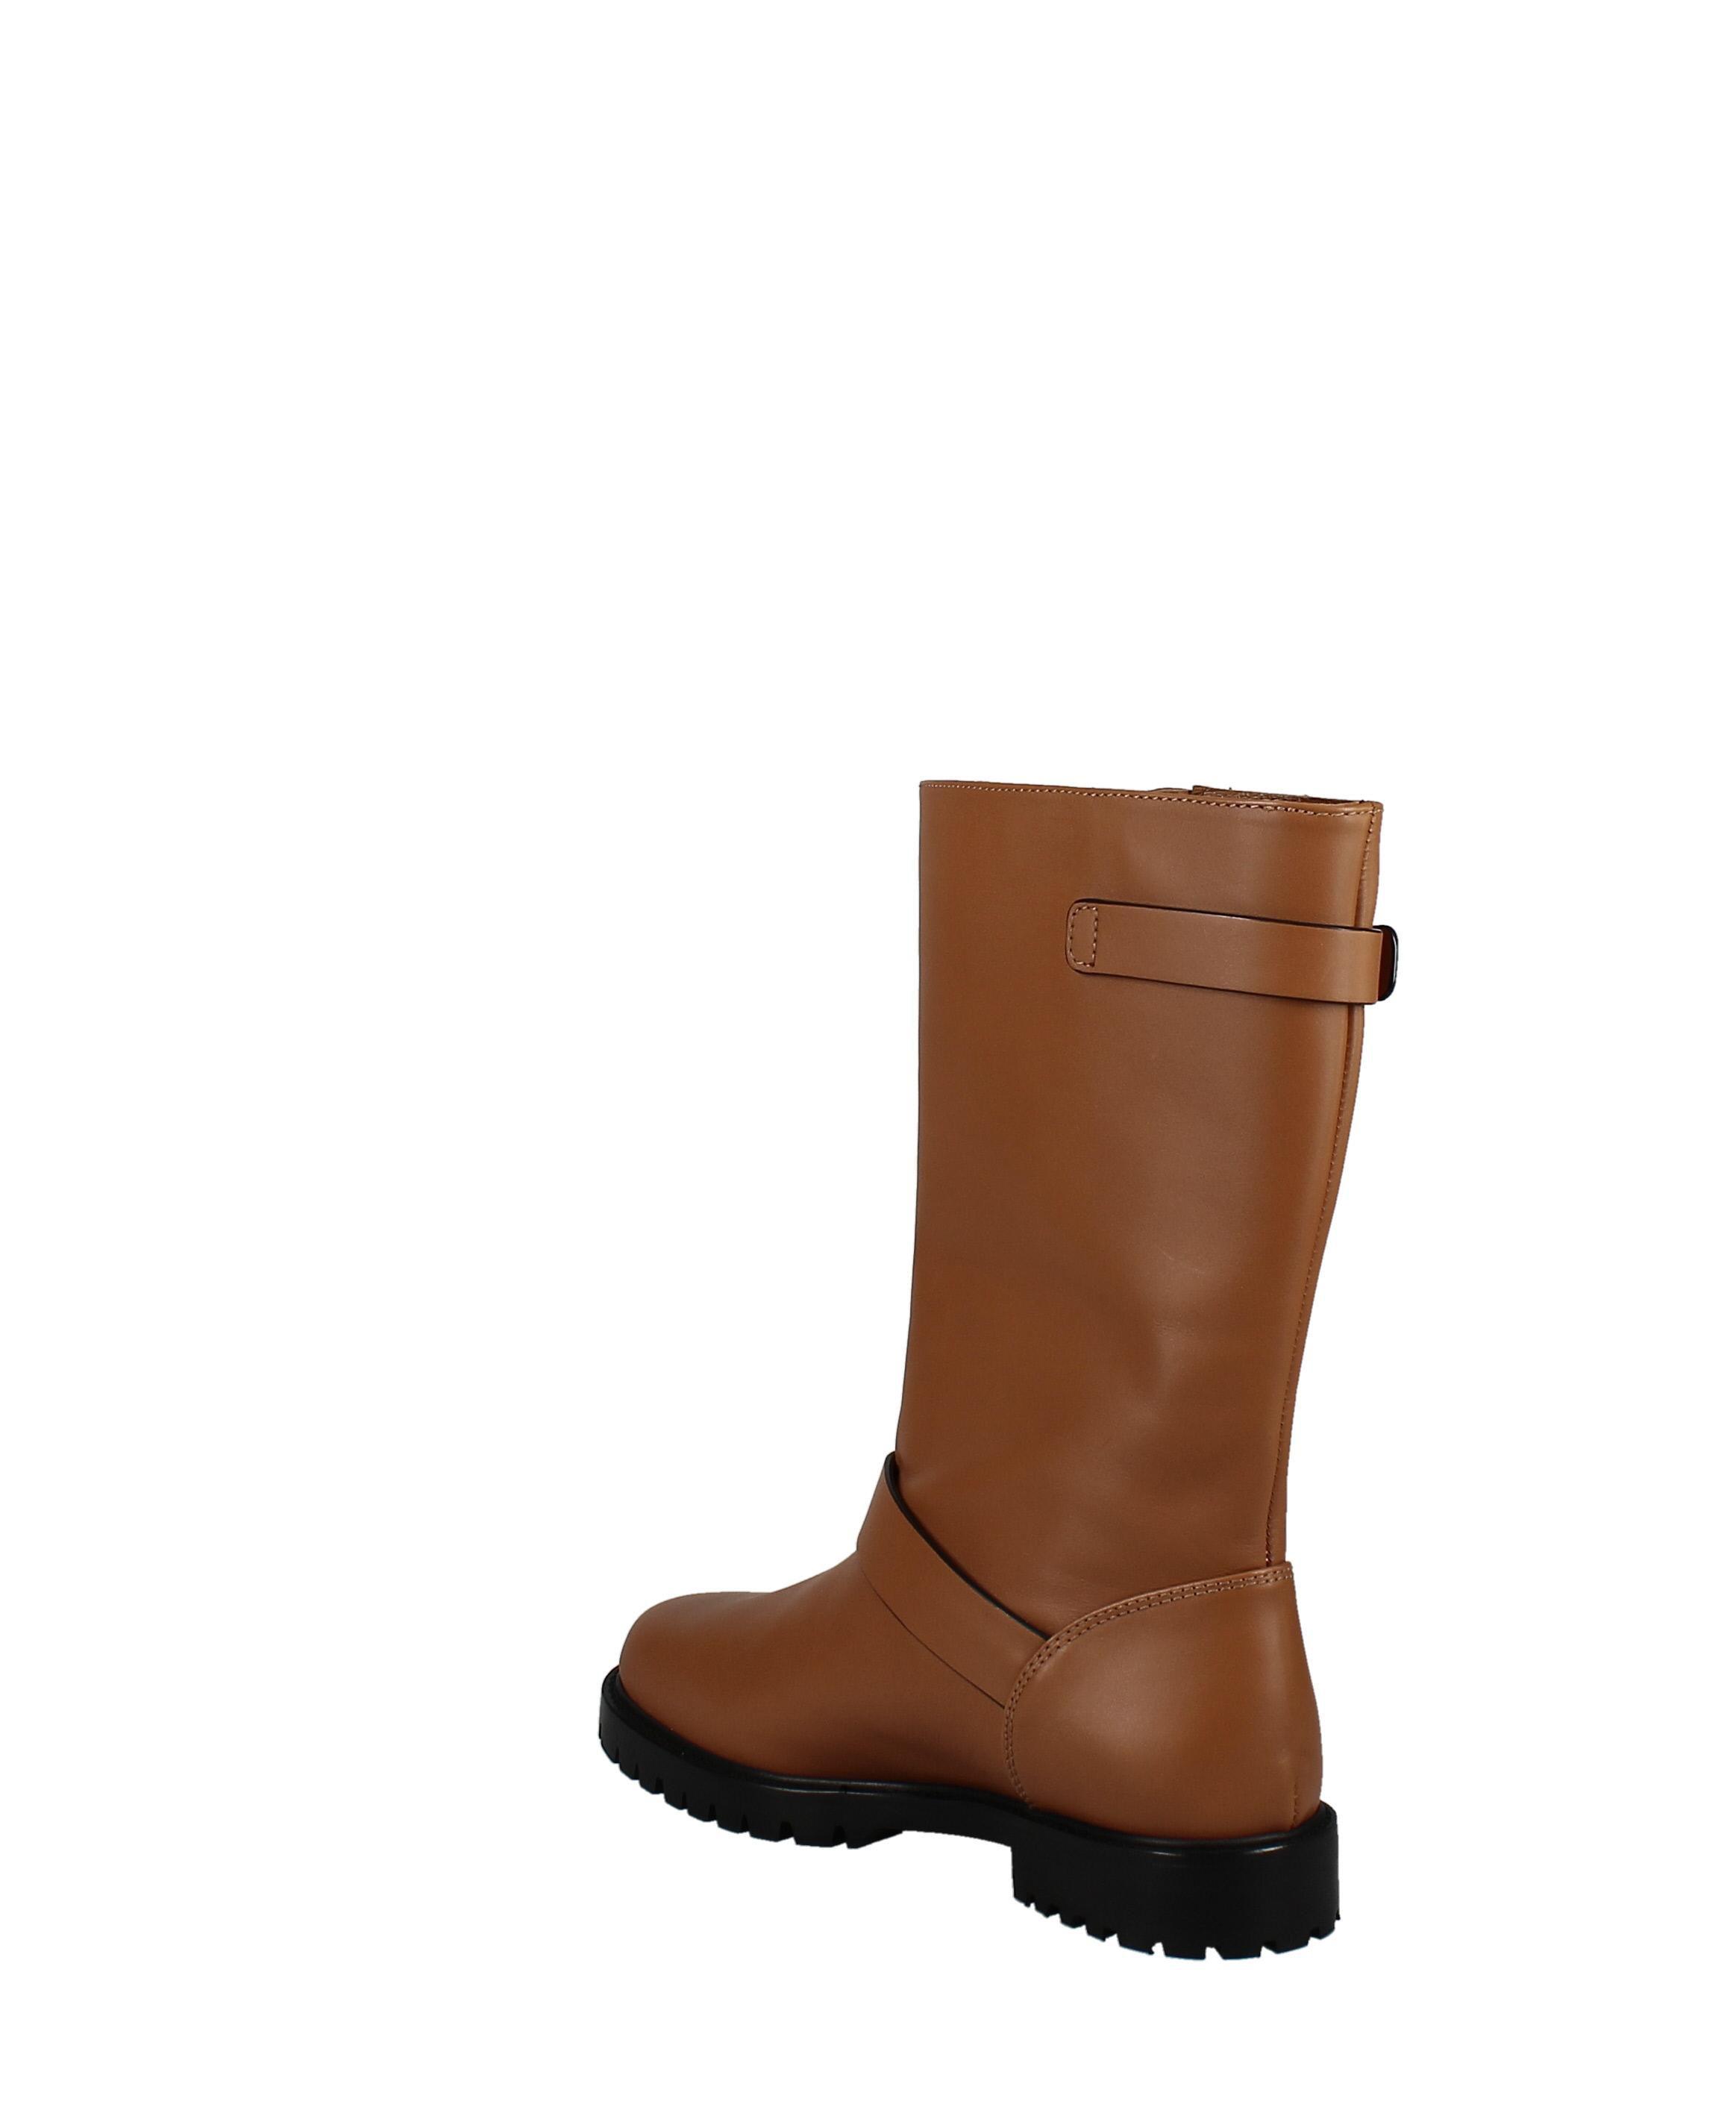 Lafayette 148   Jordan Moto Leather Boot   Tan   8 M